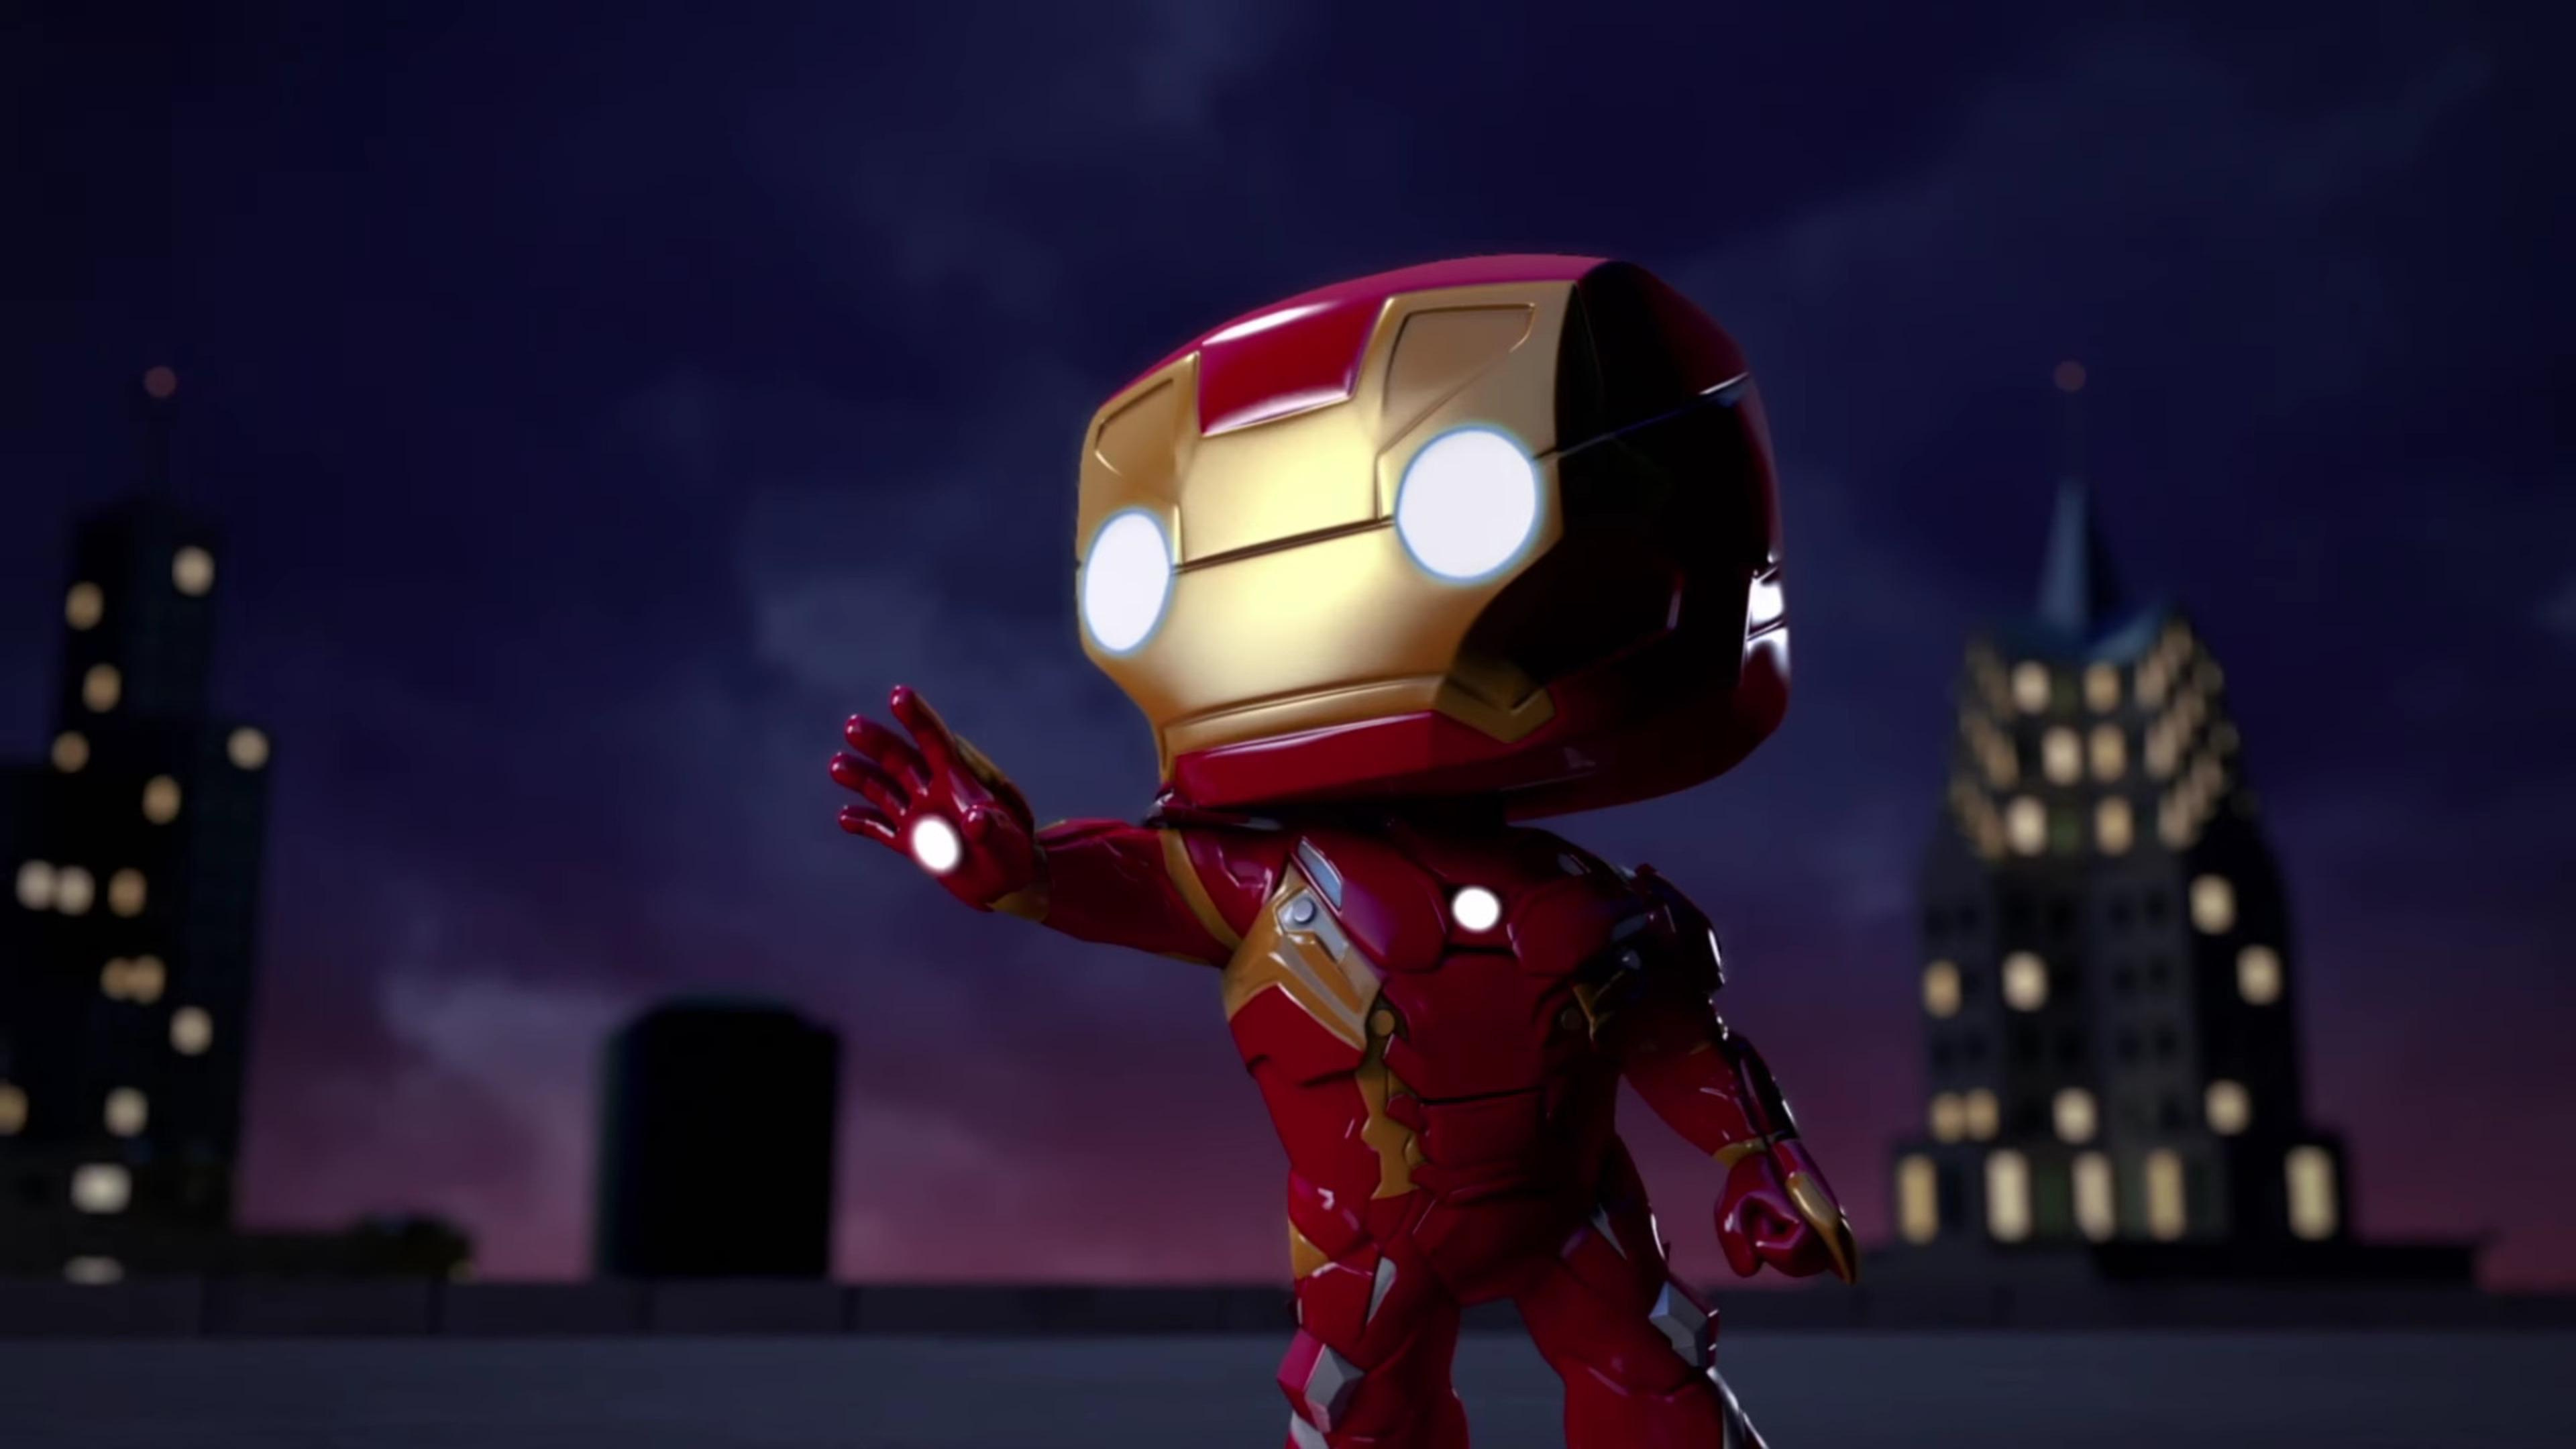 iron-man-spellbound-animated-movie-c5.jpg